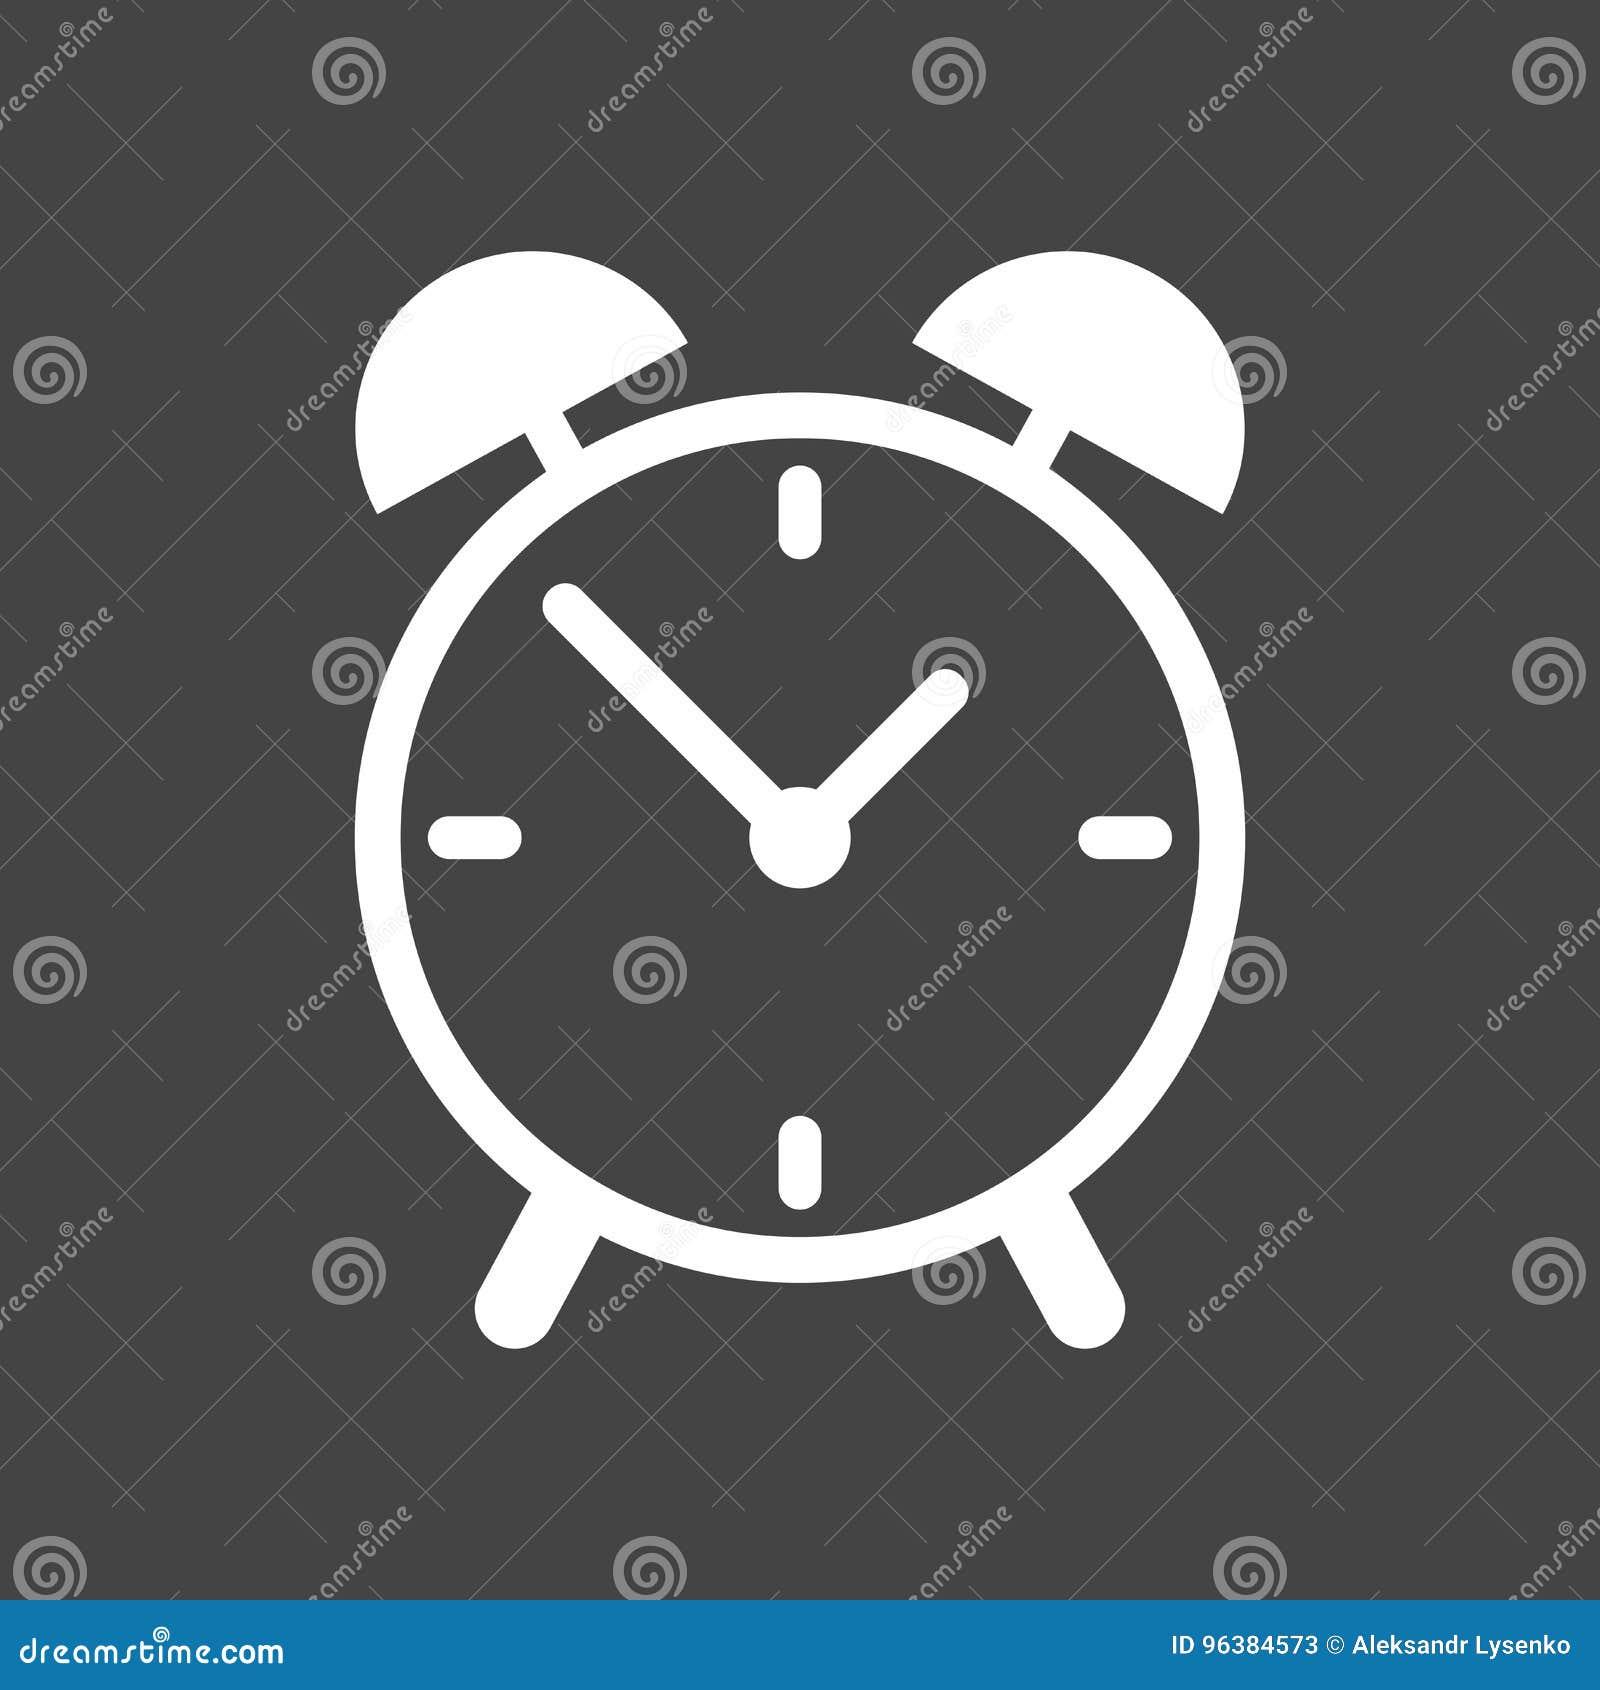 Alarm Clock Icon  Flat Design Style  Simple Icon On Grey Background